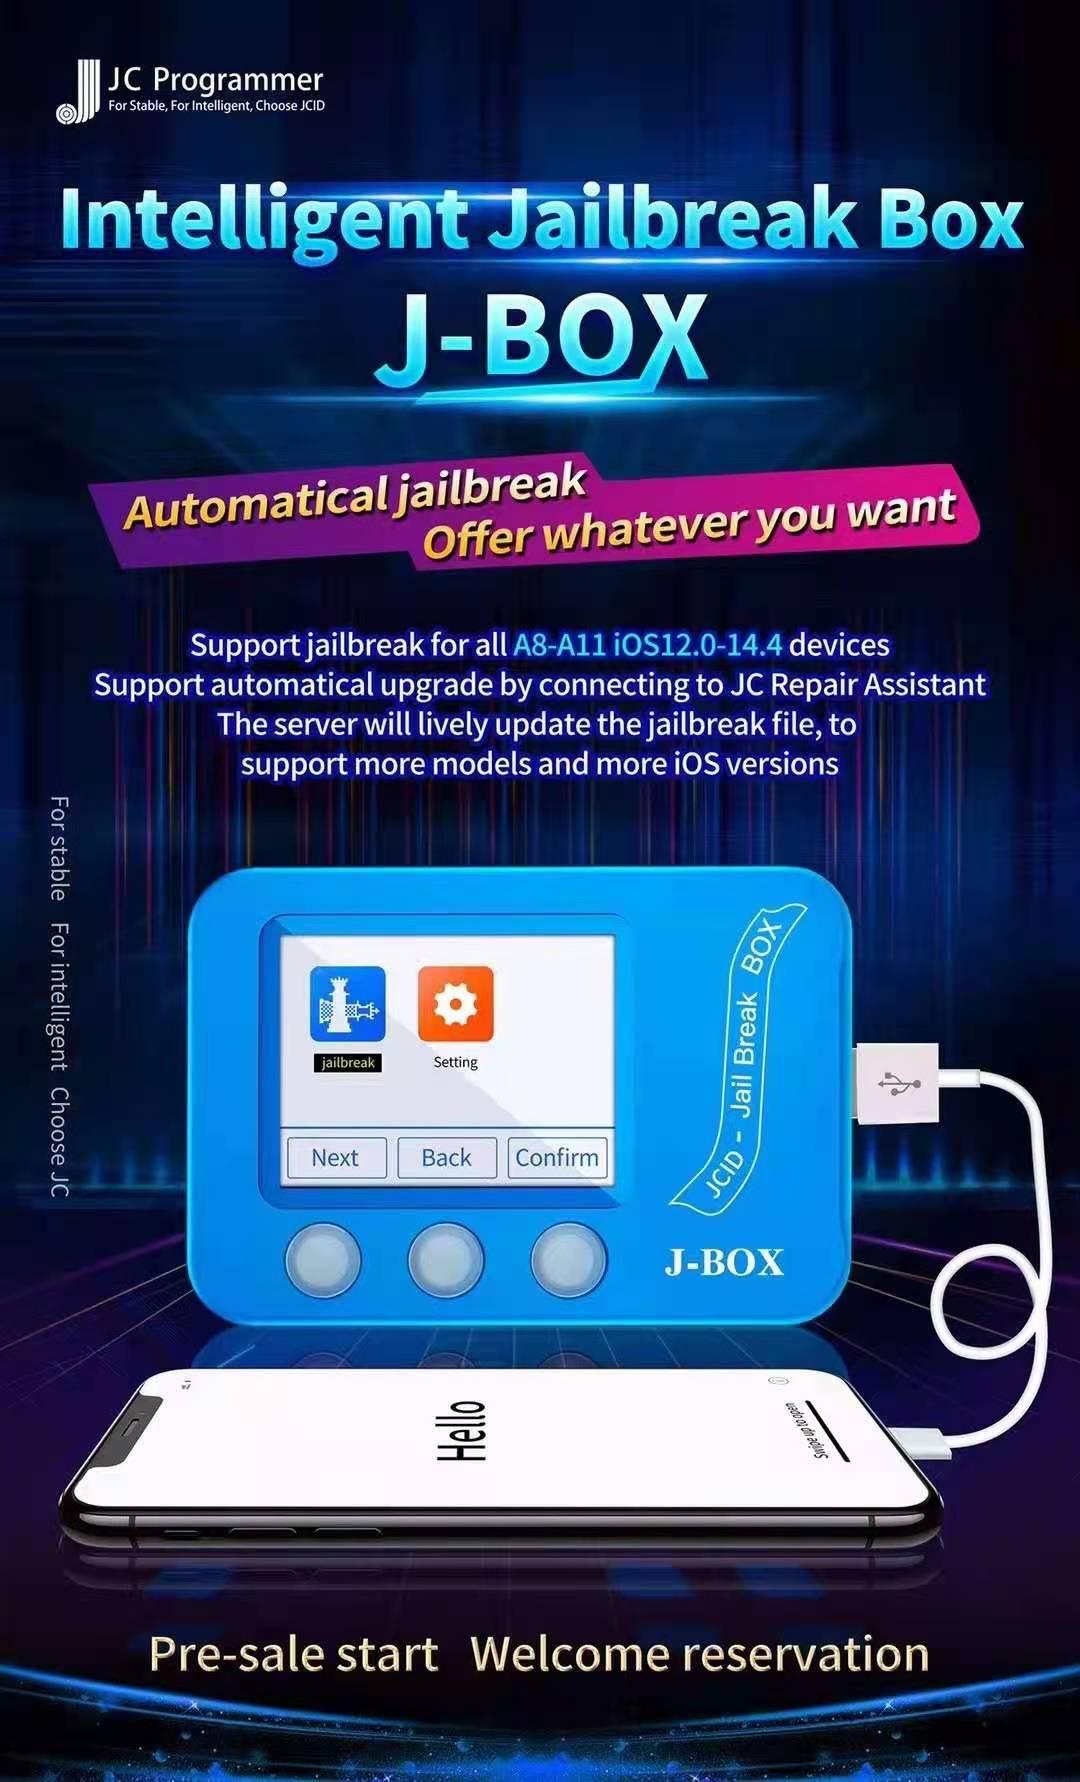 Promo J-BOX jail break box jcid Programmer for bypass ID & icloud Password on iOS device for iphone ipad Check wifi bluetooth address